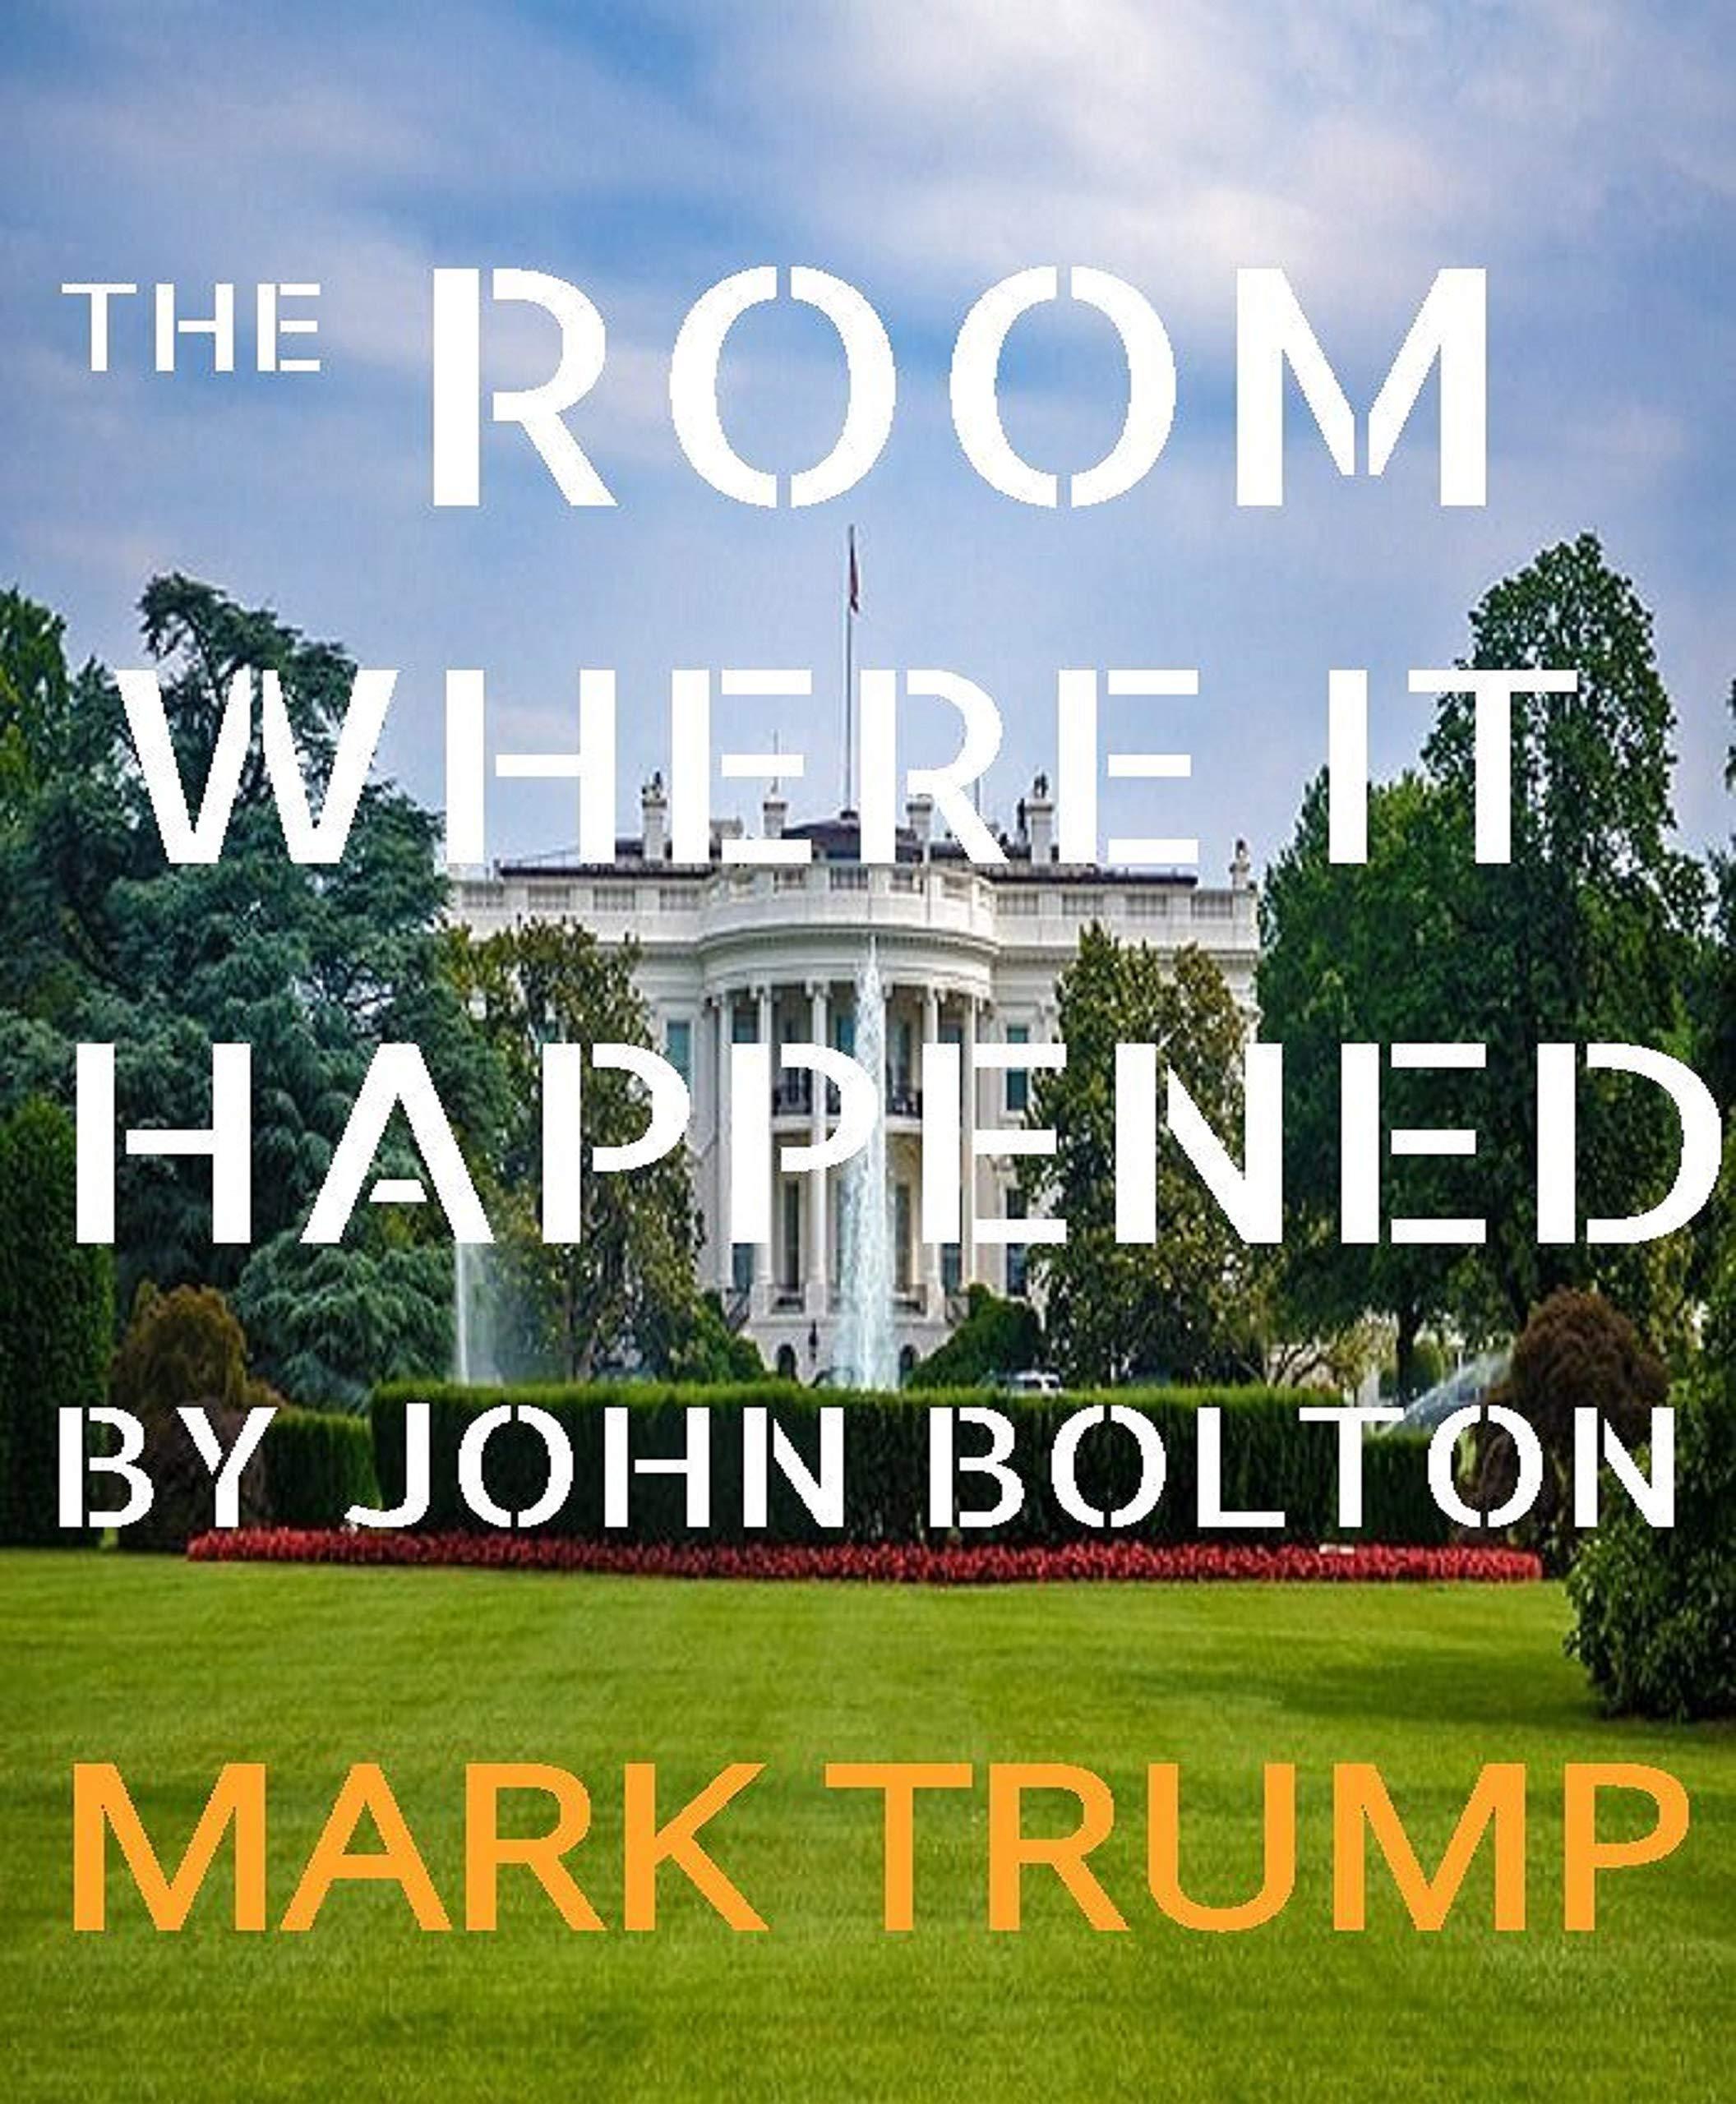 The Room Where It Happened By John Bolton: A White House Memoir